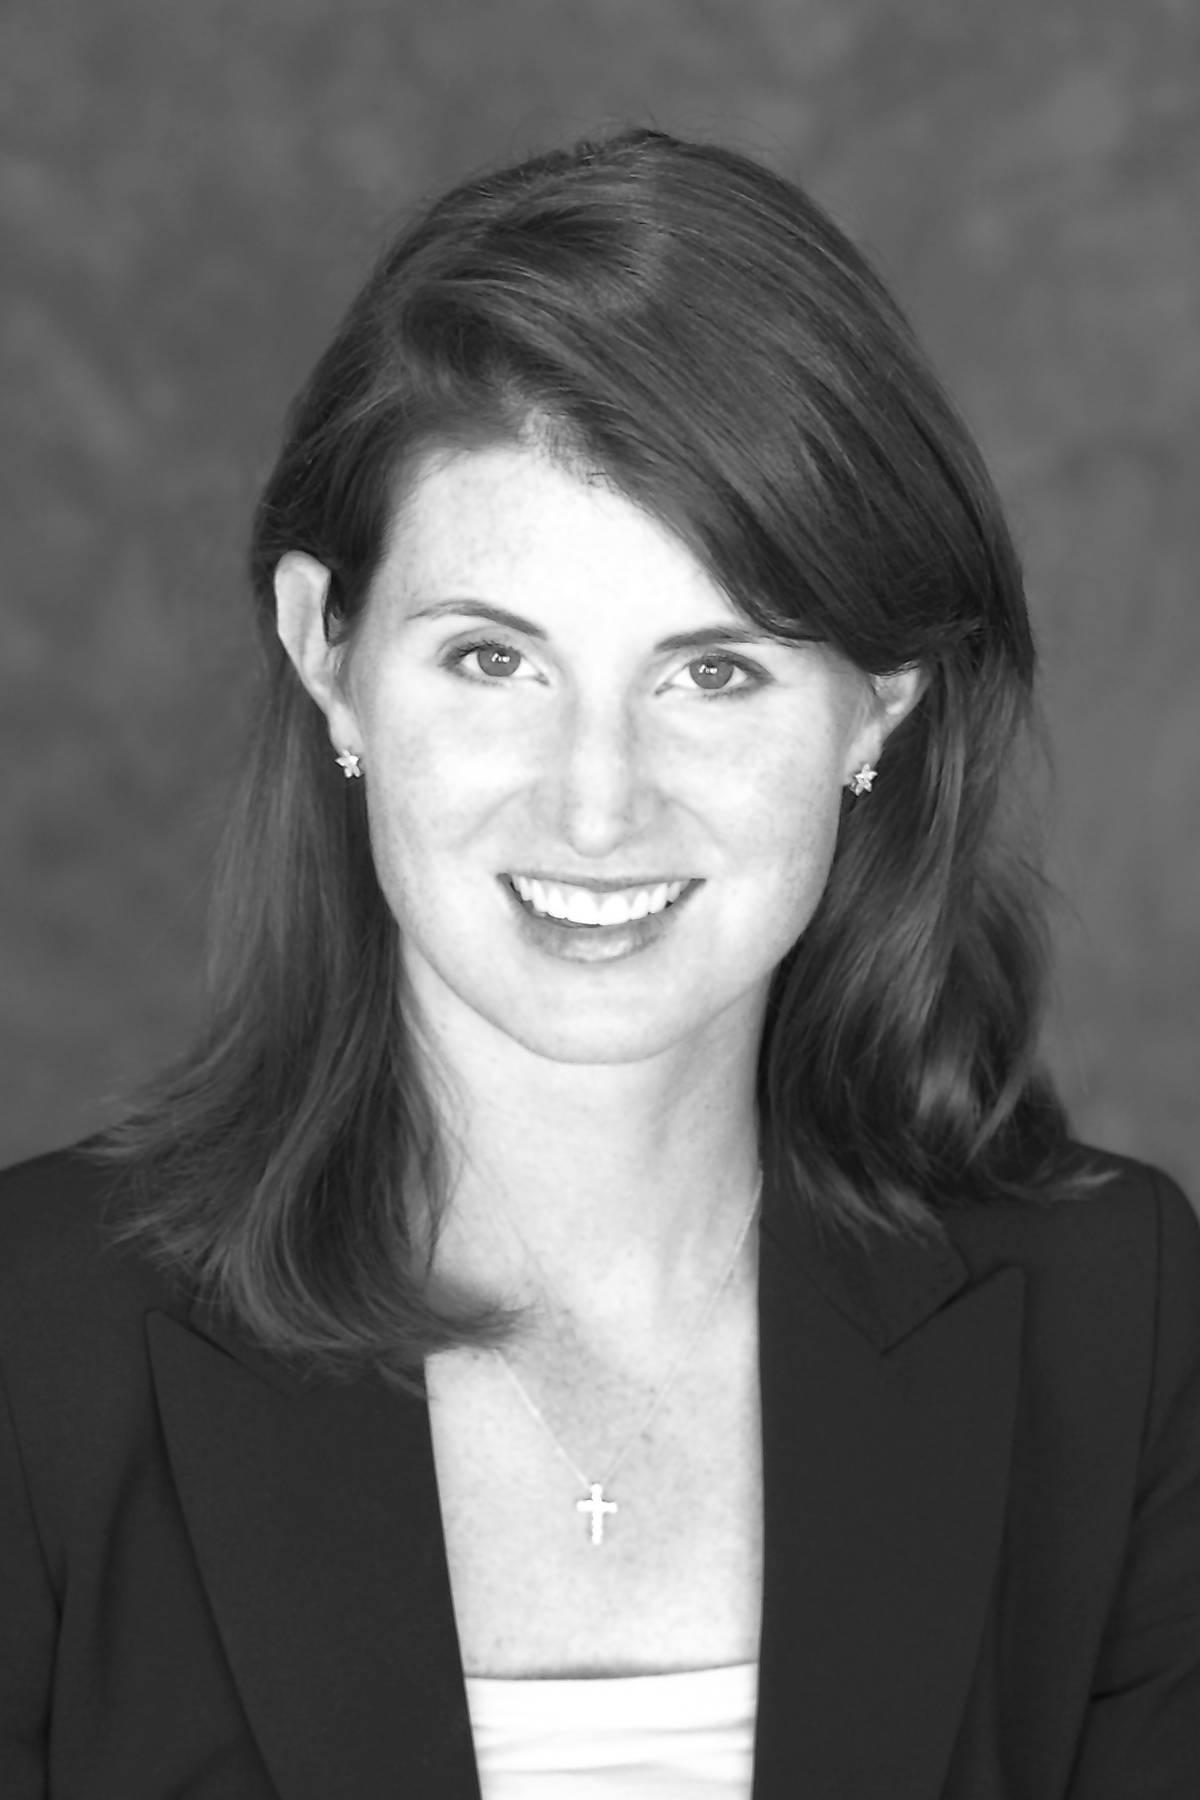 Dr. Sara Edwards